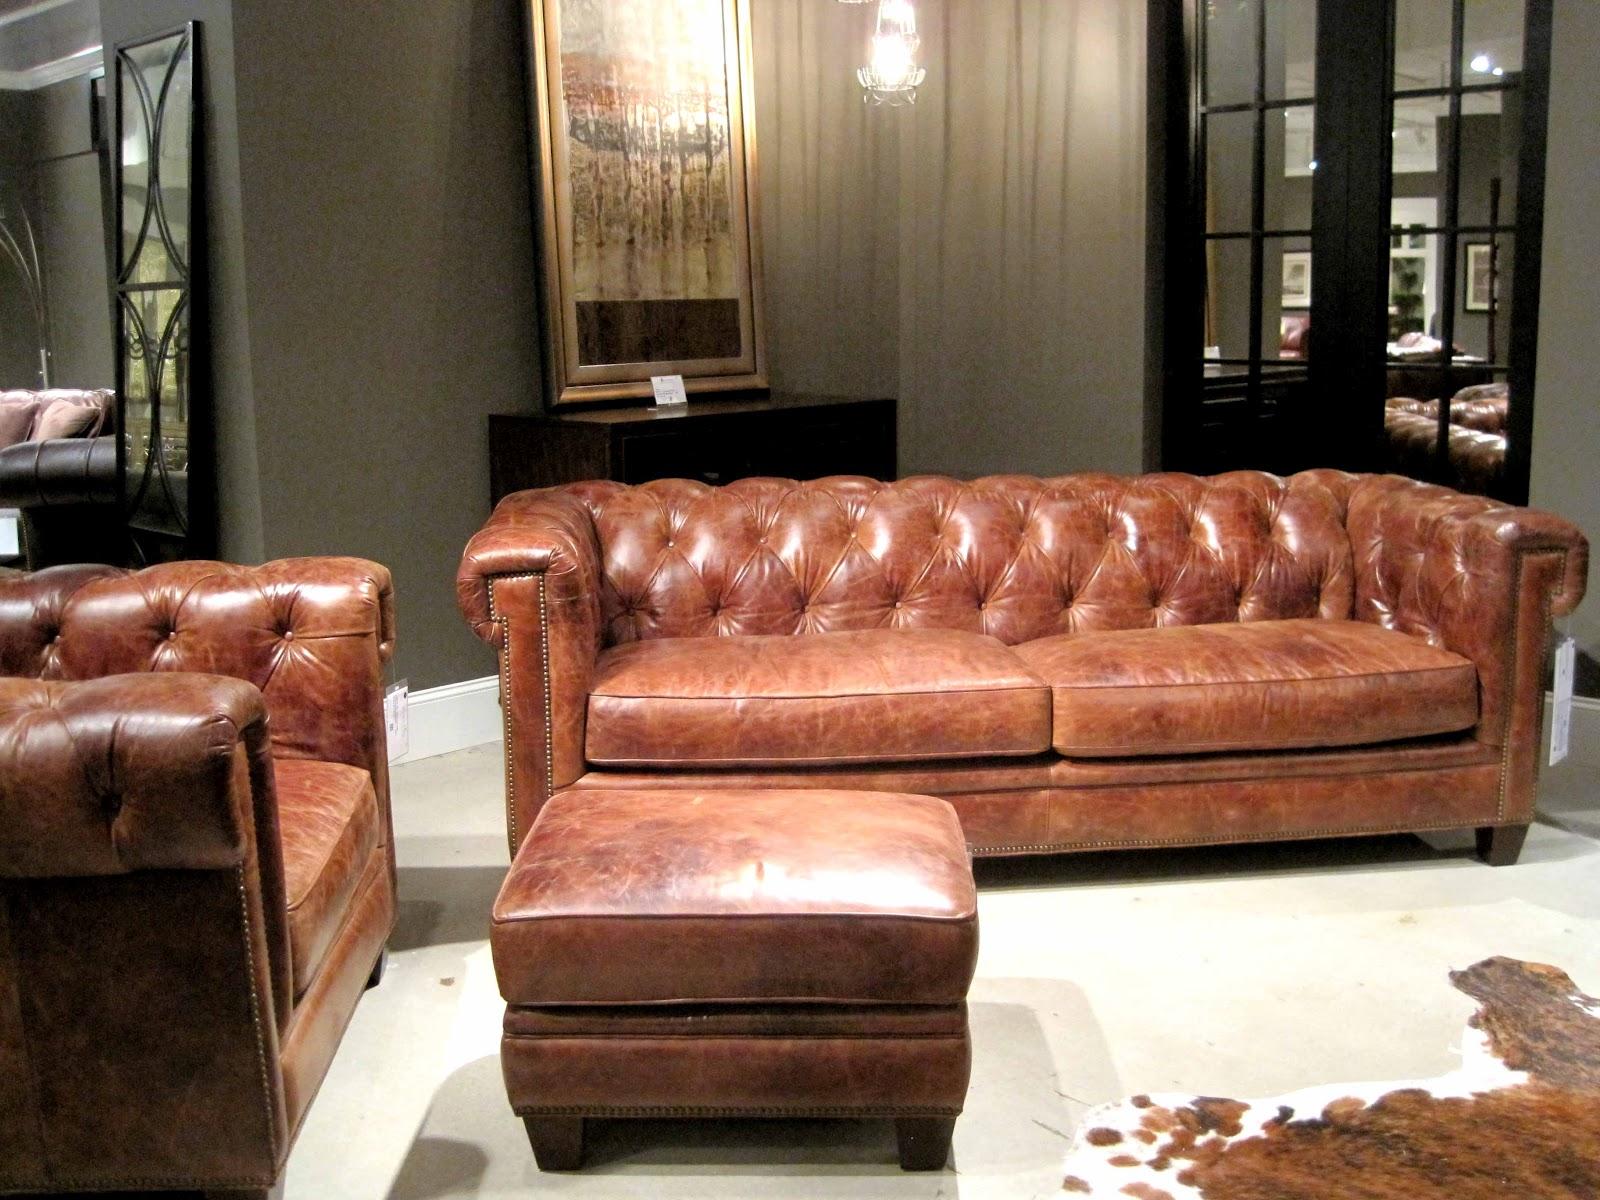 Excellent Highpoint 2012 Hooker Furniture Design And Interior Home Spiritservingveterans Wood Chair Design Ideas Spiritservingveteransorg